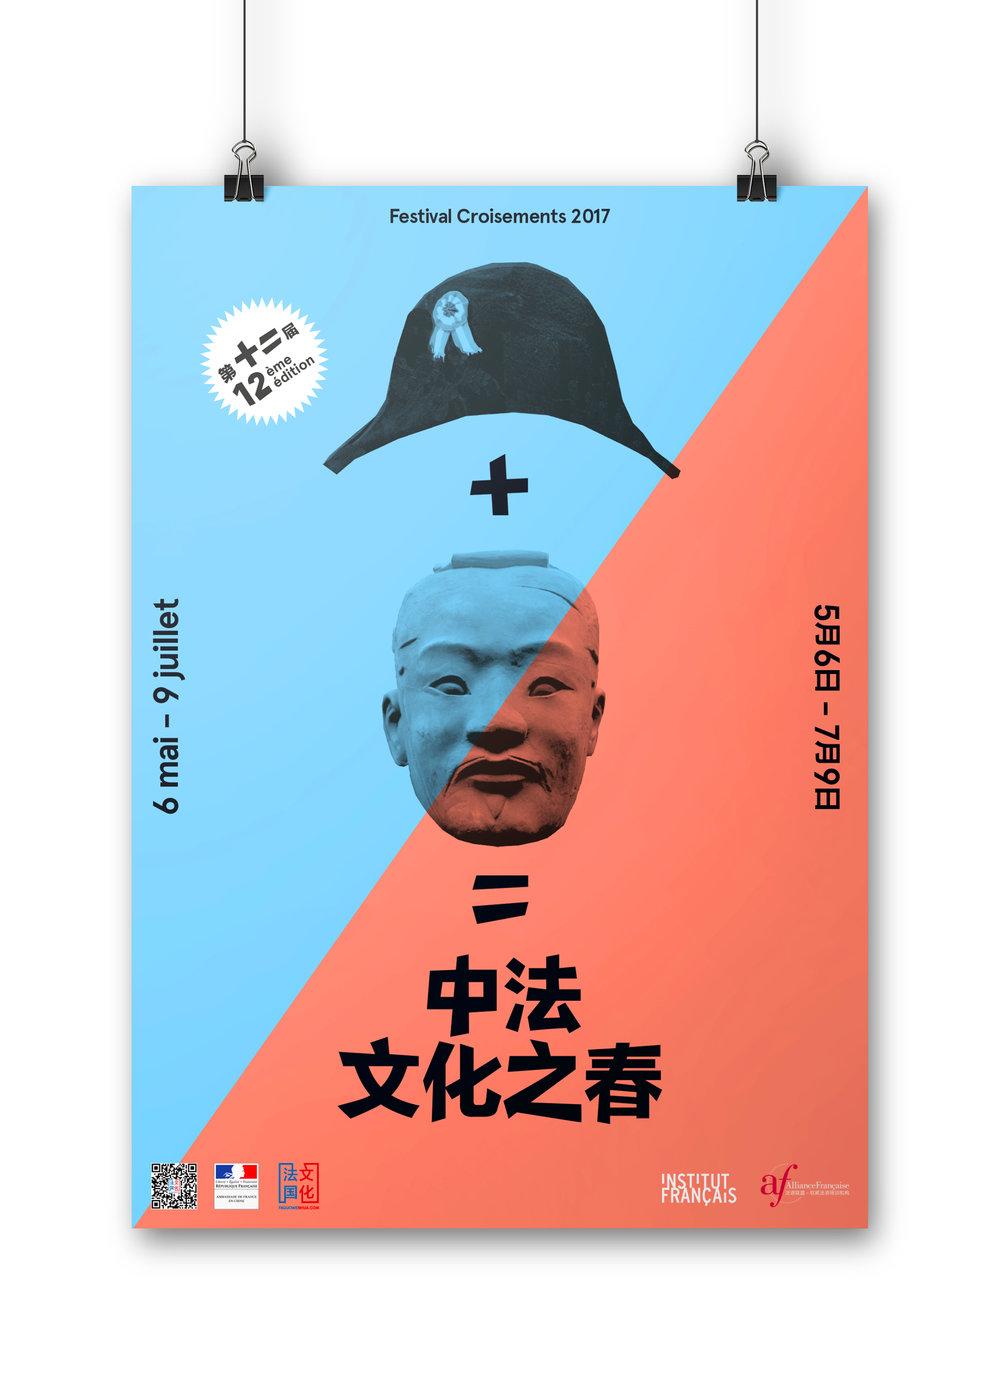 Festival Croisements 2017, courtesy of Lava Beijing